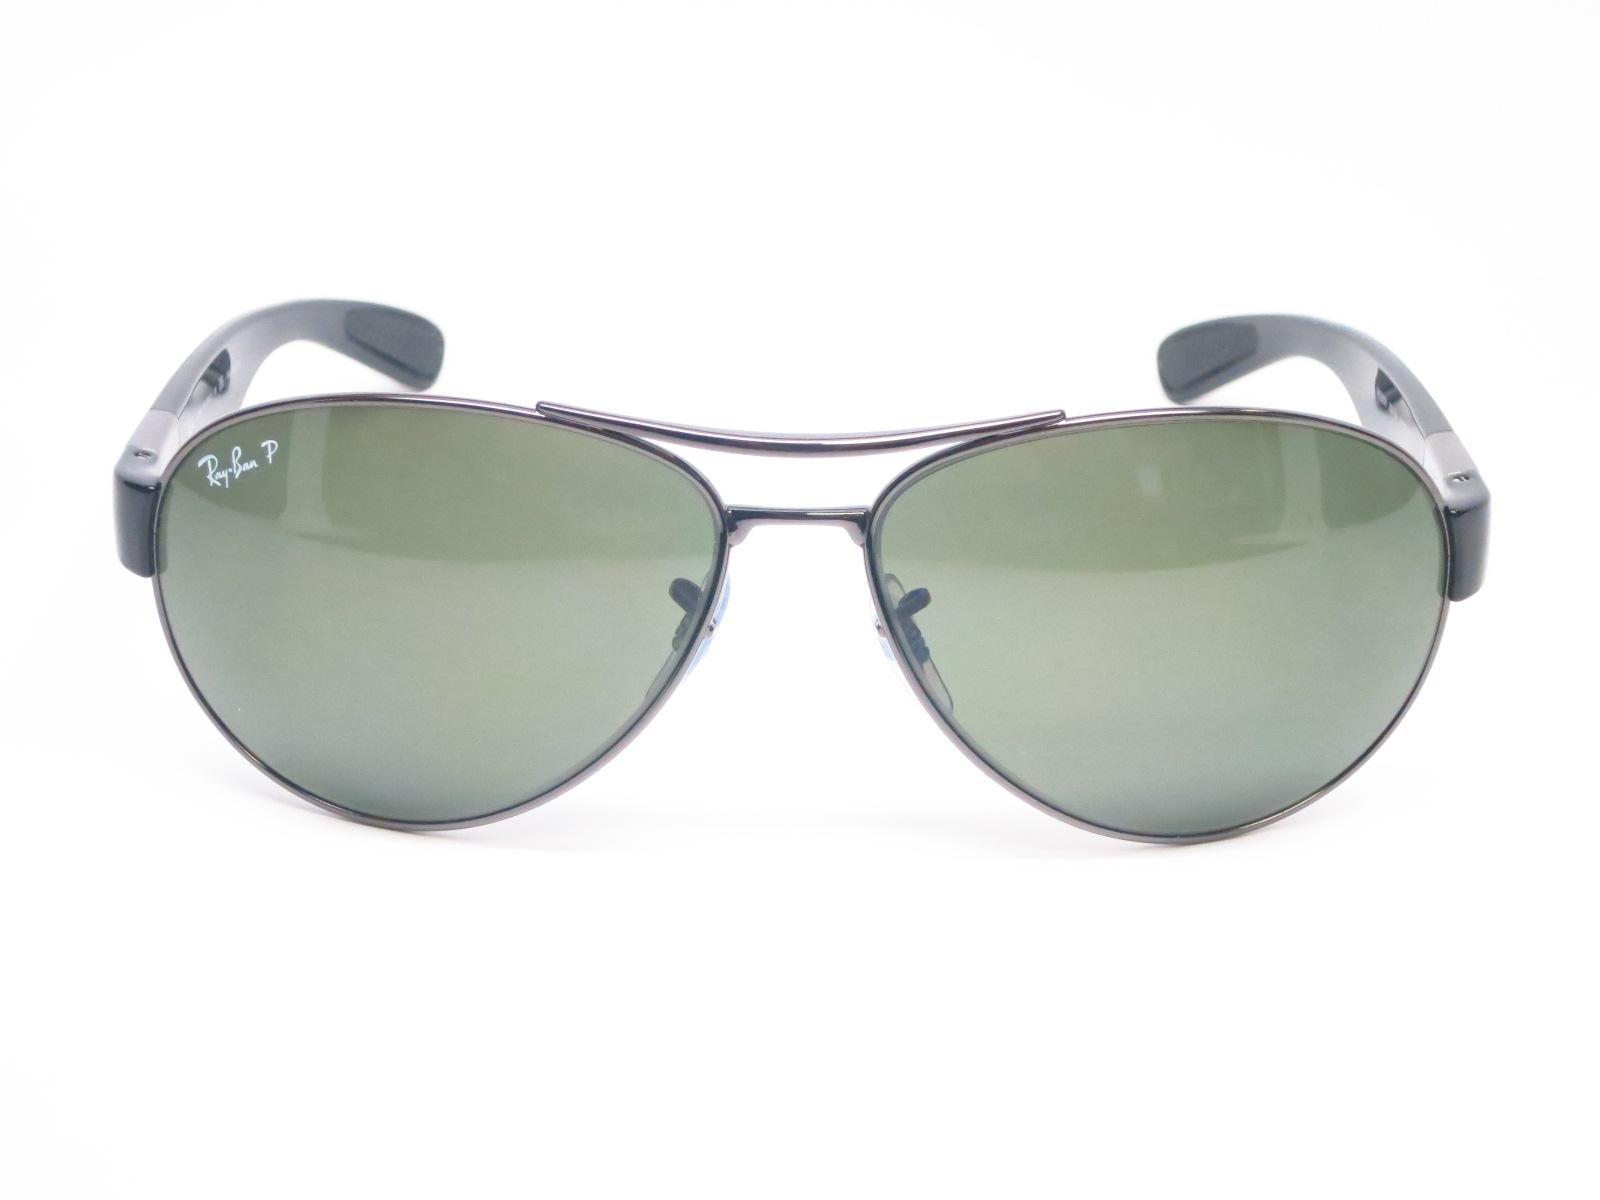 9dc8030b451 Ray-Ban RB 3509 004 9A Gunmetal Polarized Sunglasses